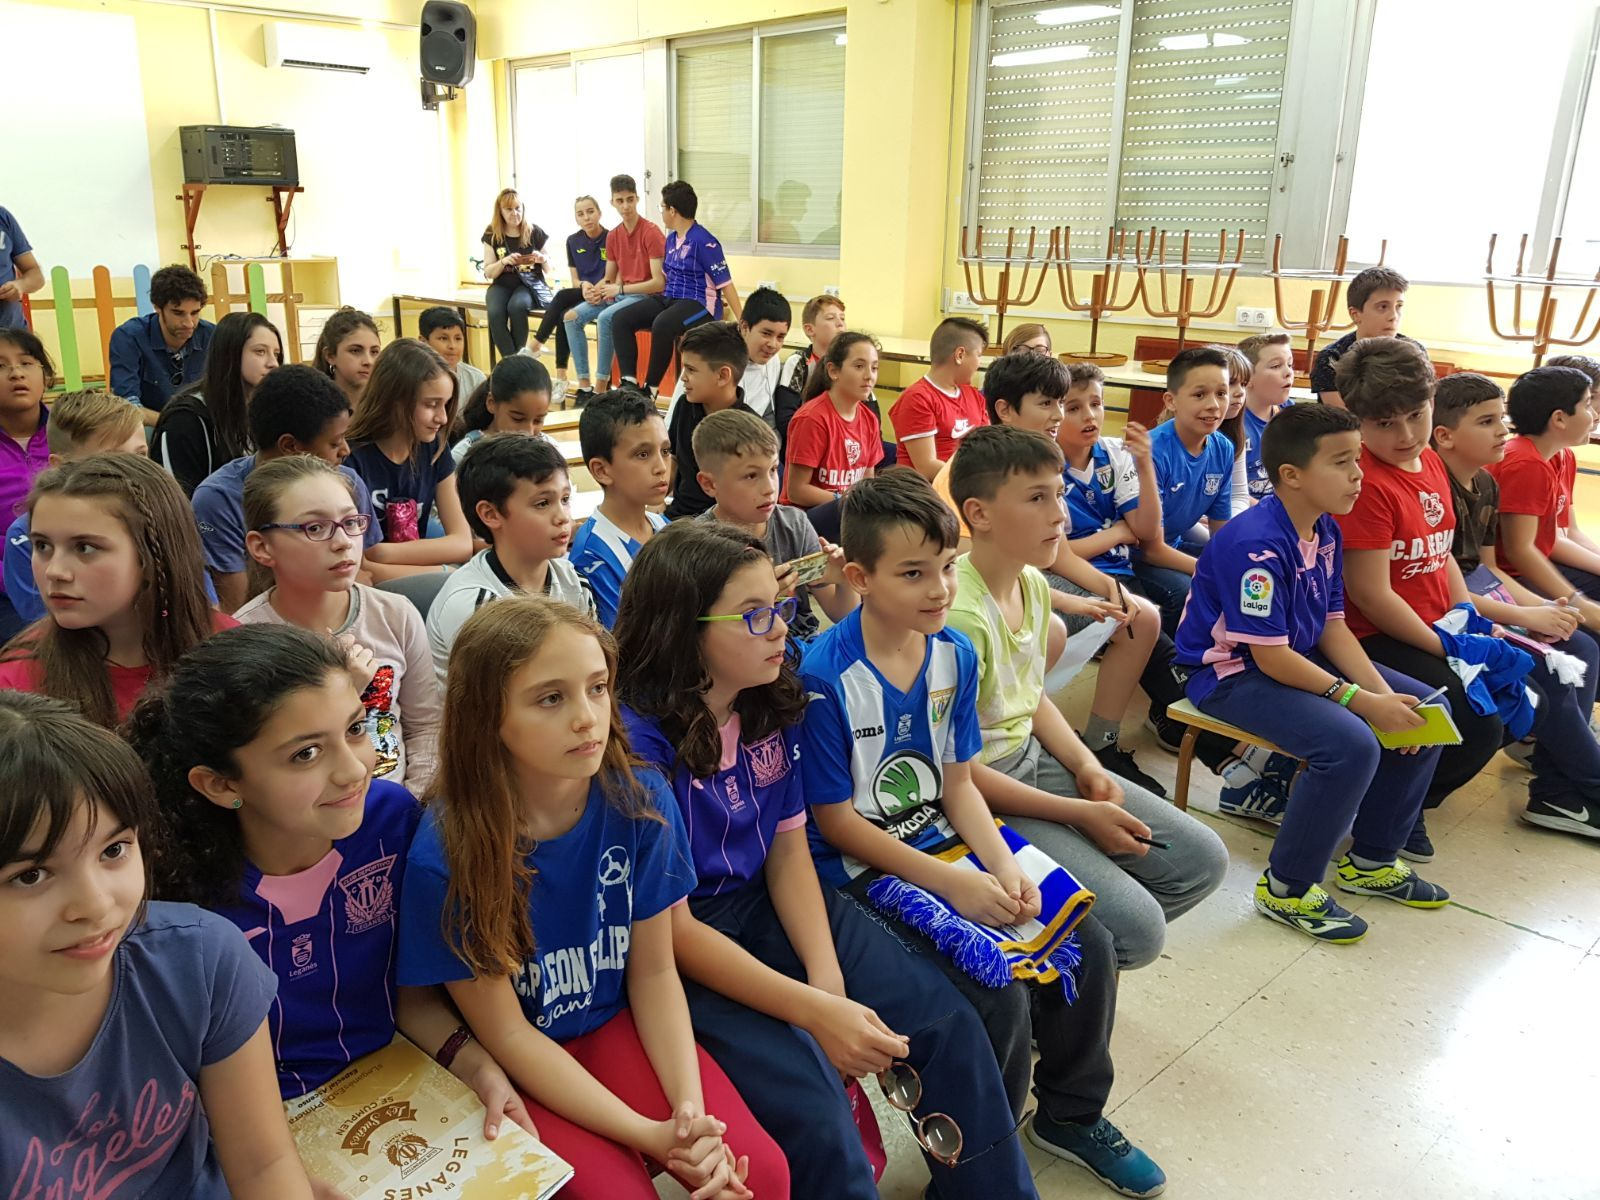 Los jugadores del C.F. Leganés visitan el cole 3